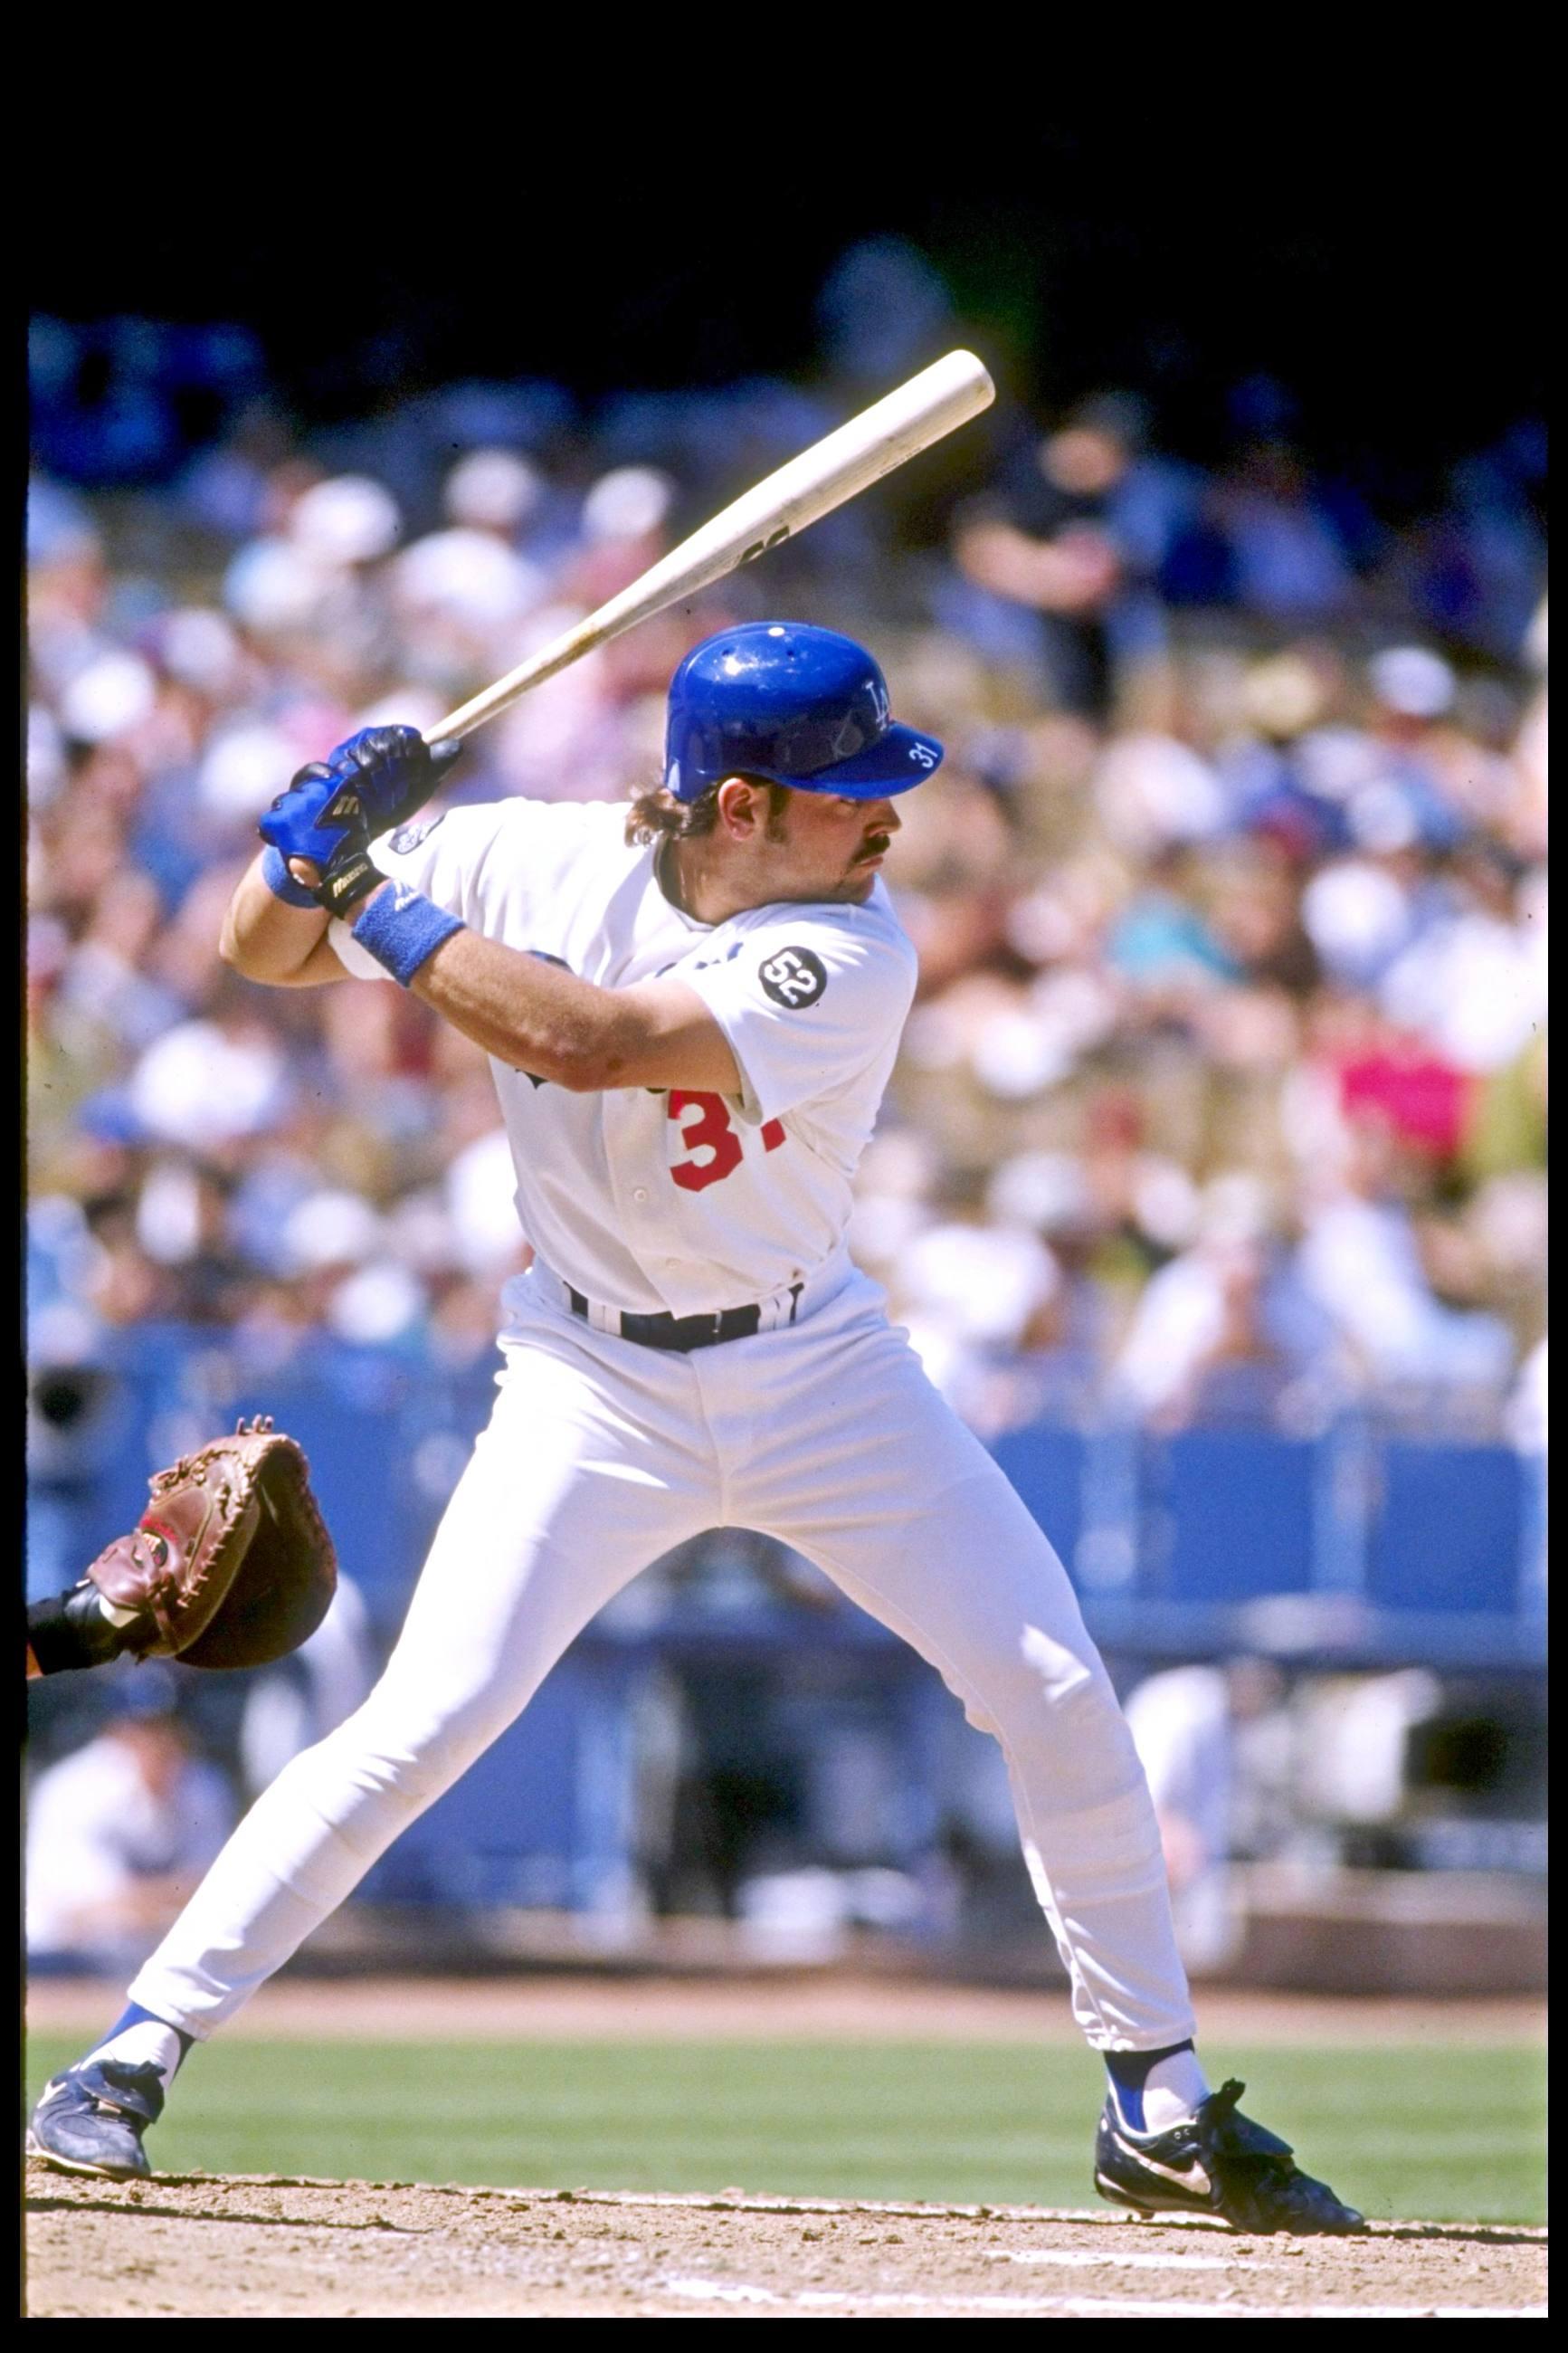 Dodgers catcher Mike Piazza at bat